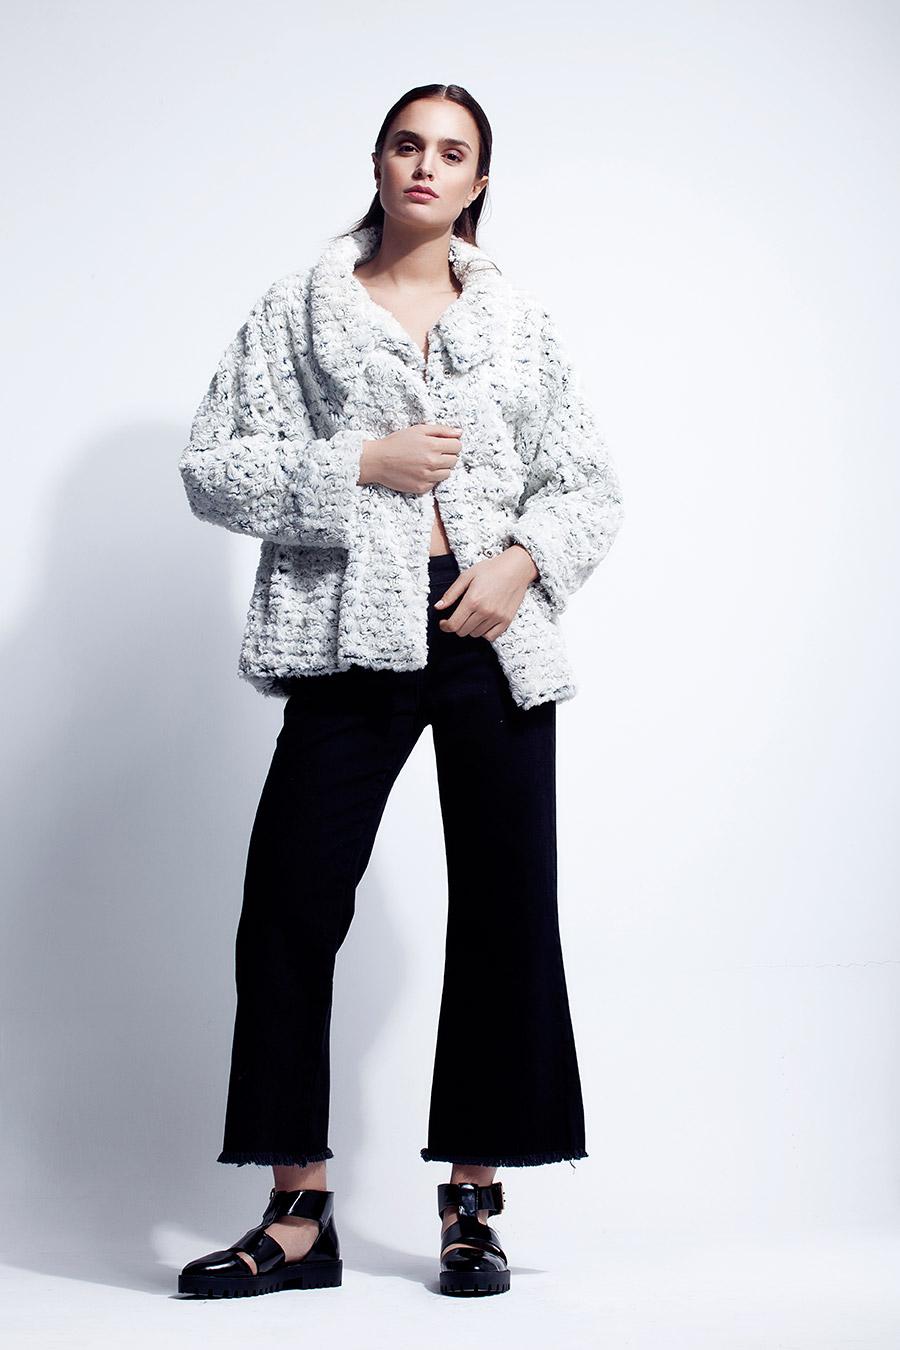 fashion-editorial-julio-paniagua-06